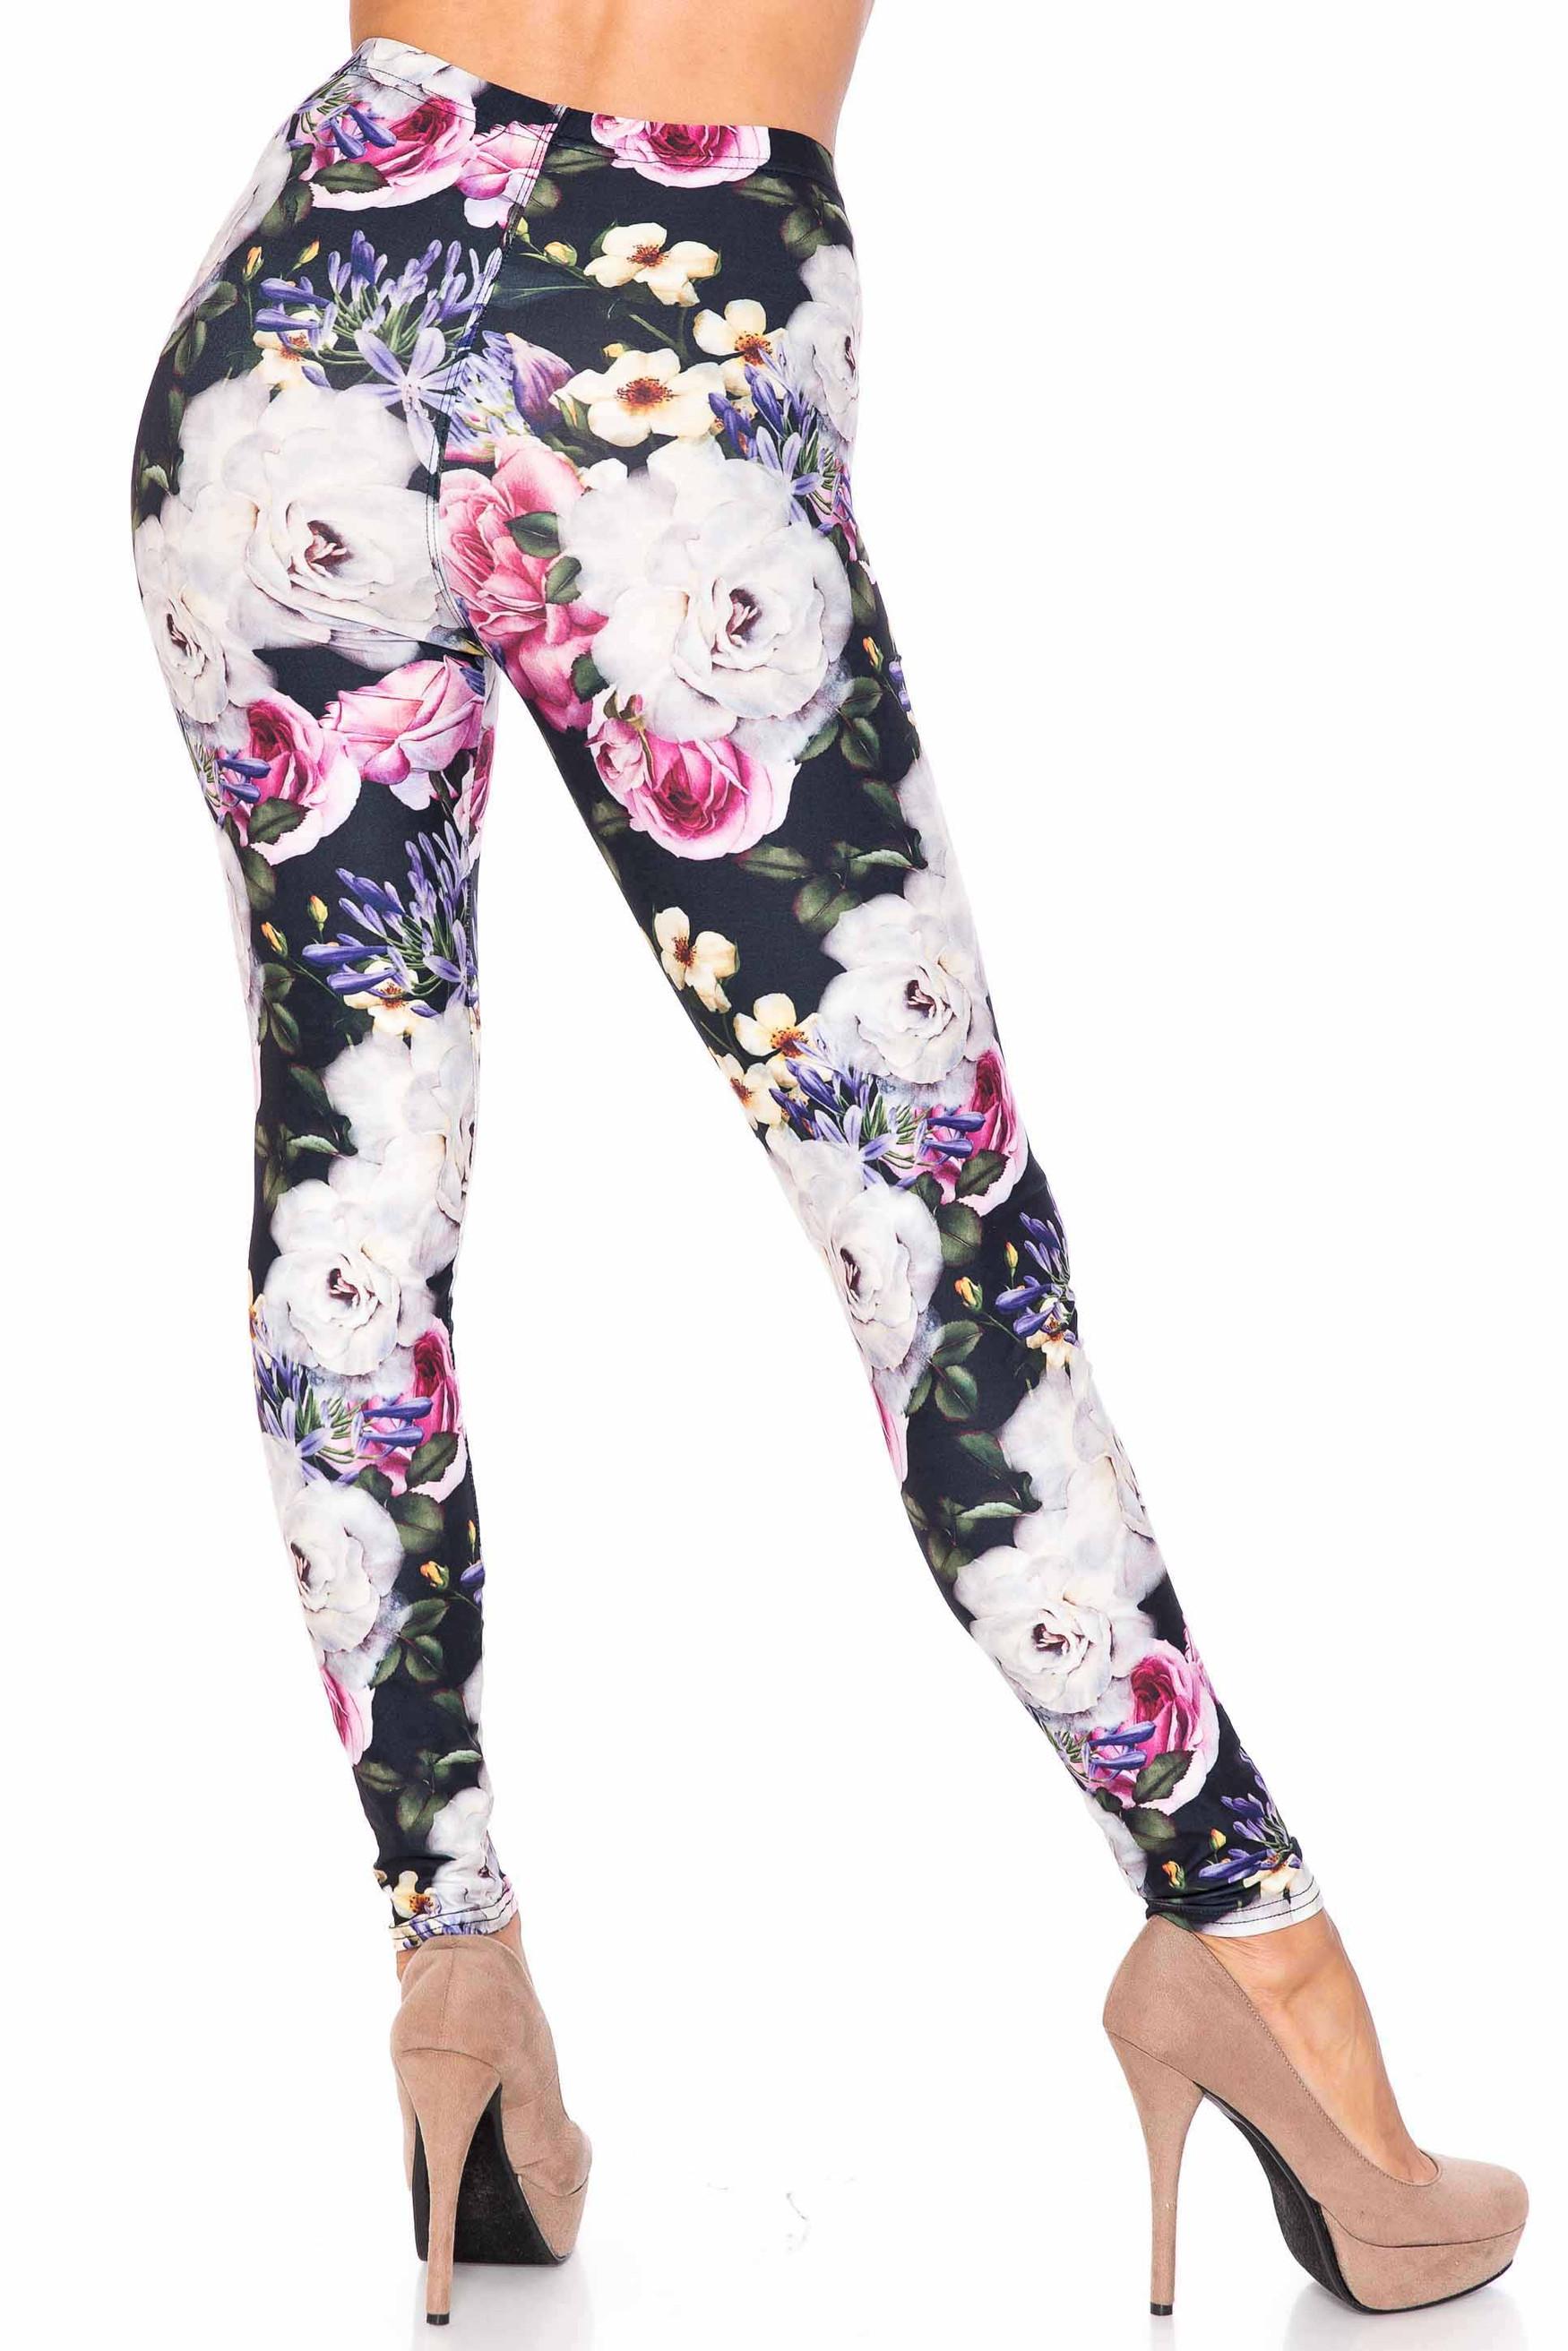 Creamy Soft Floral Garden Bouquet Leggings - USA Fashion™